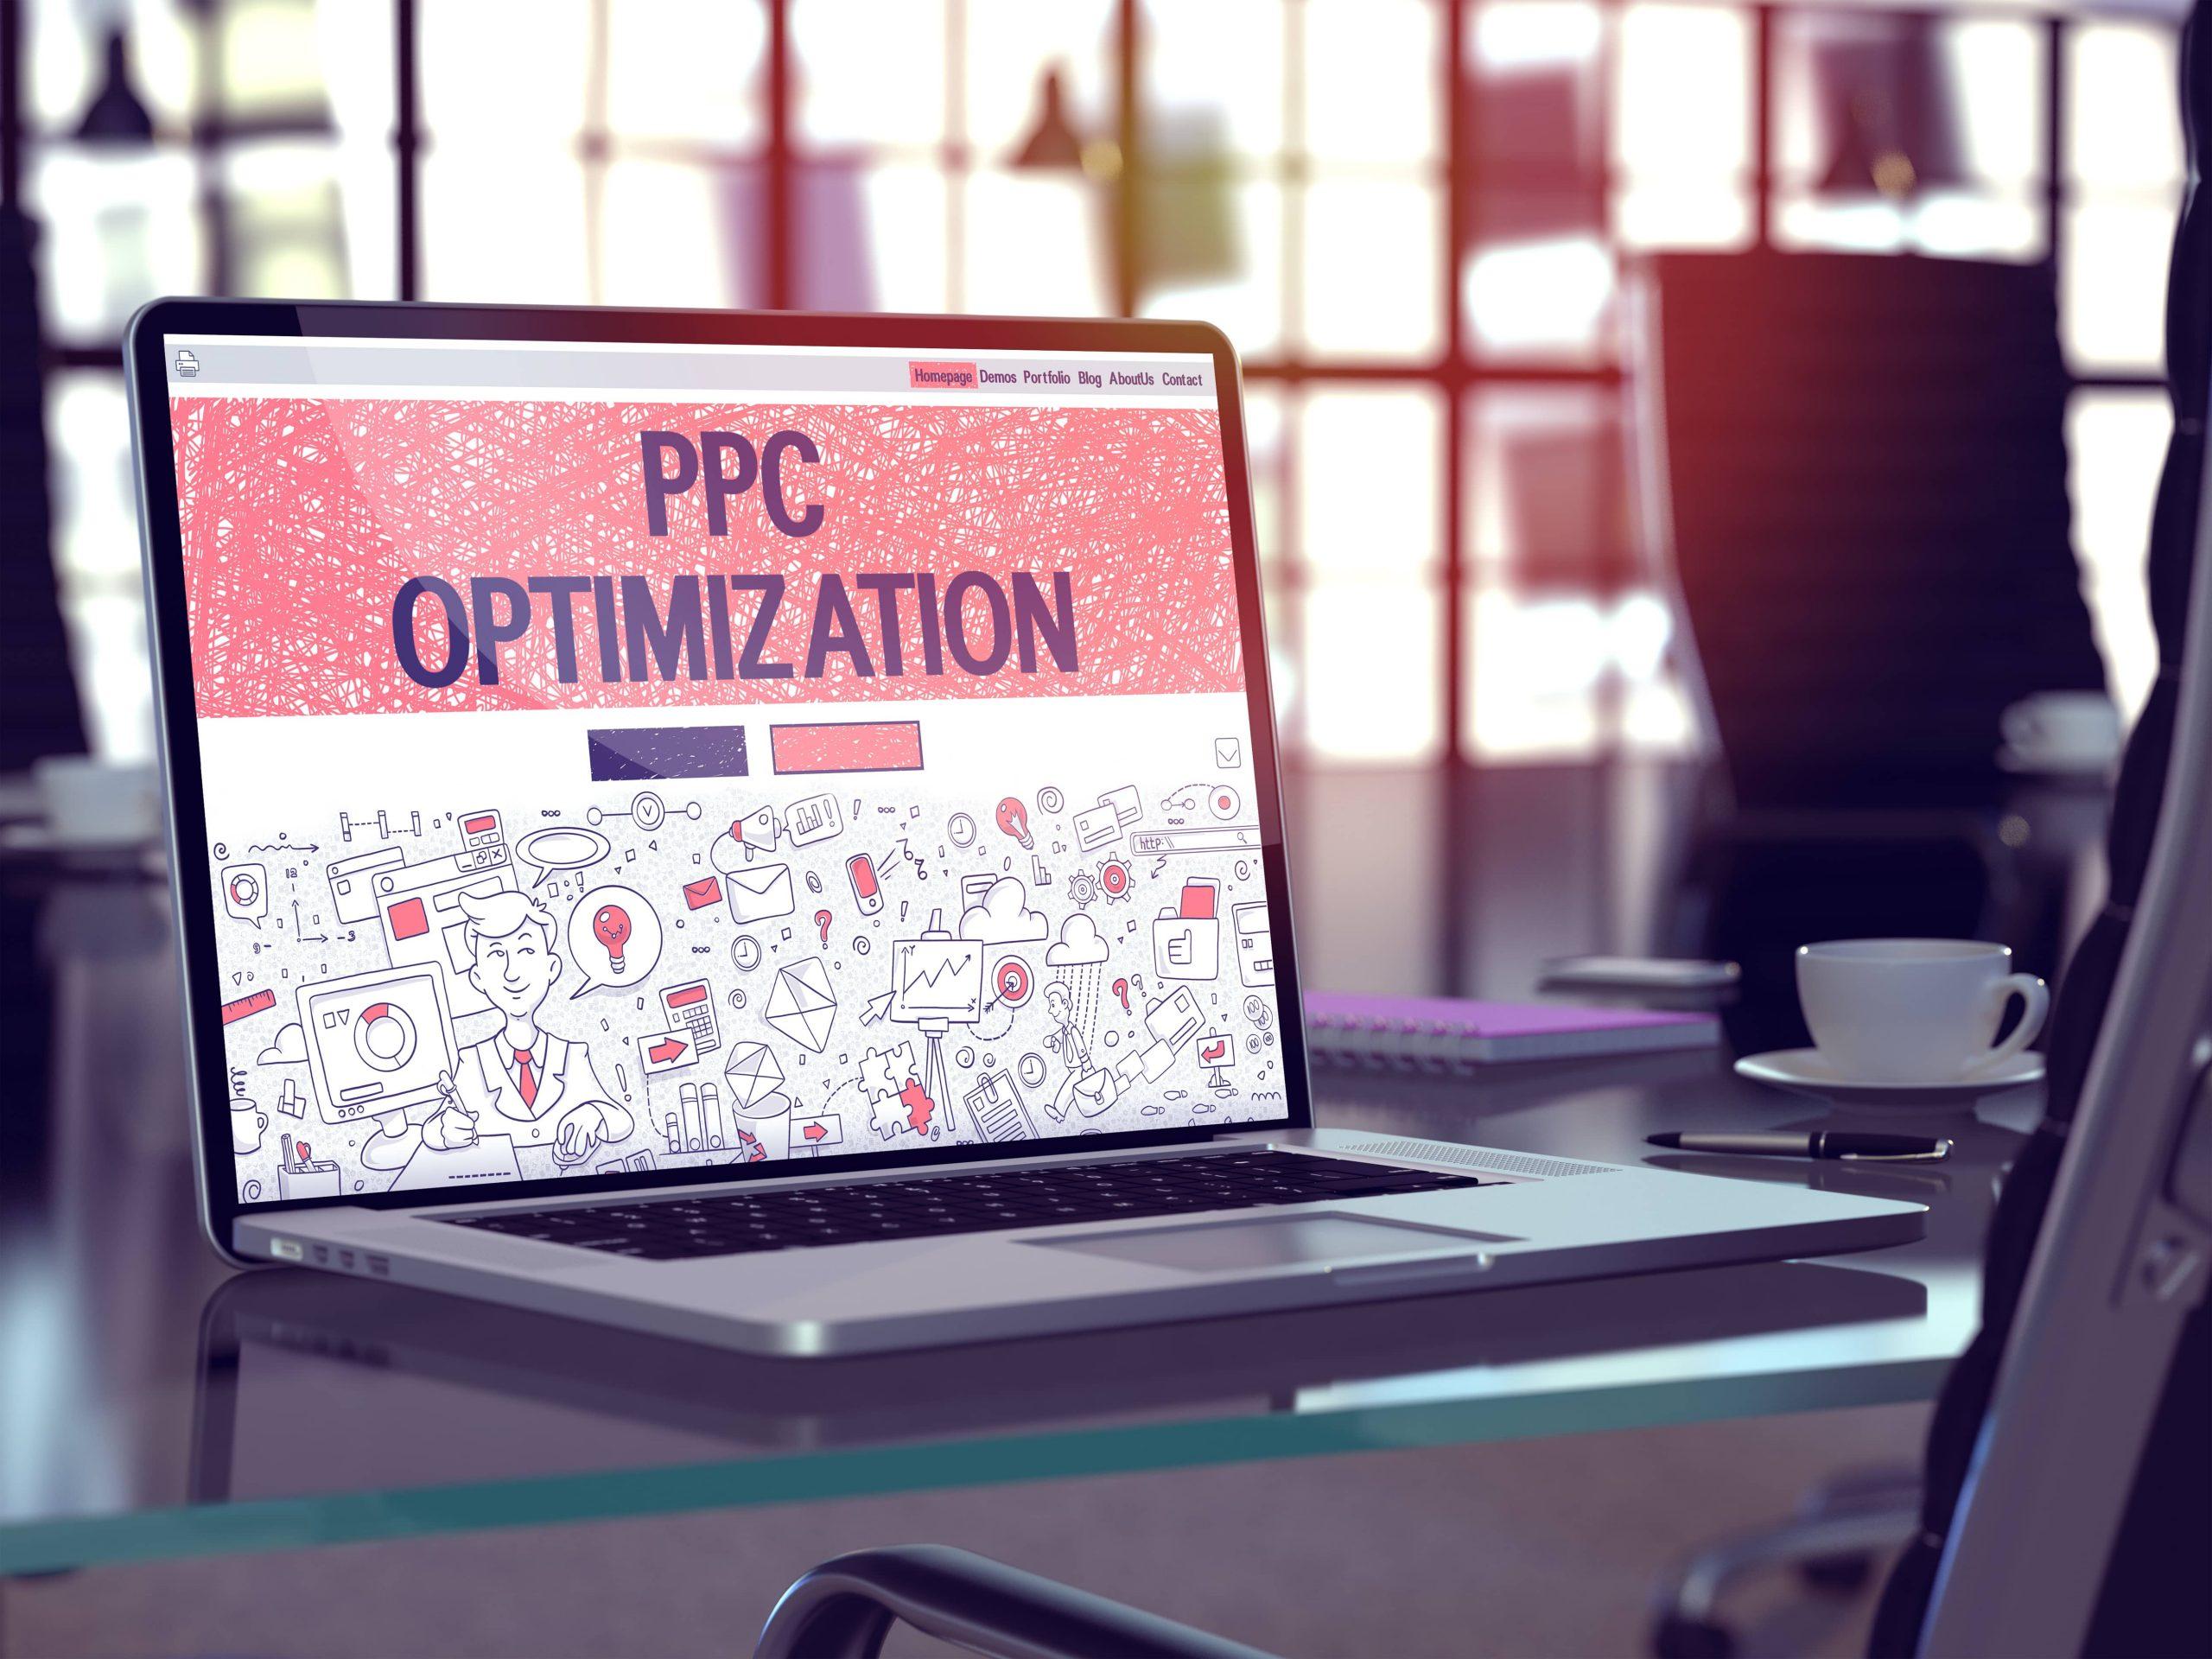 amazon ppc optimization